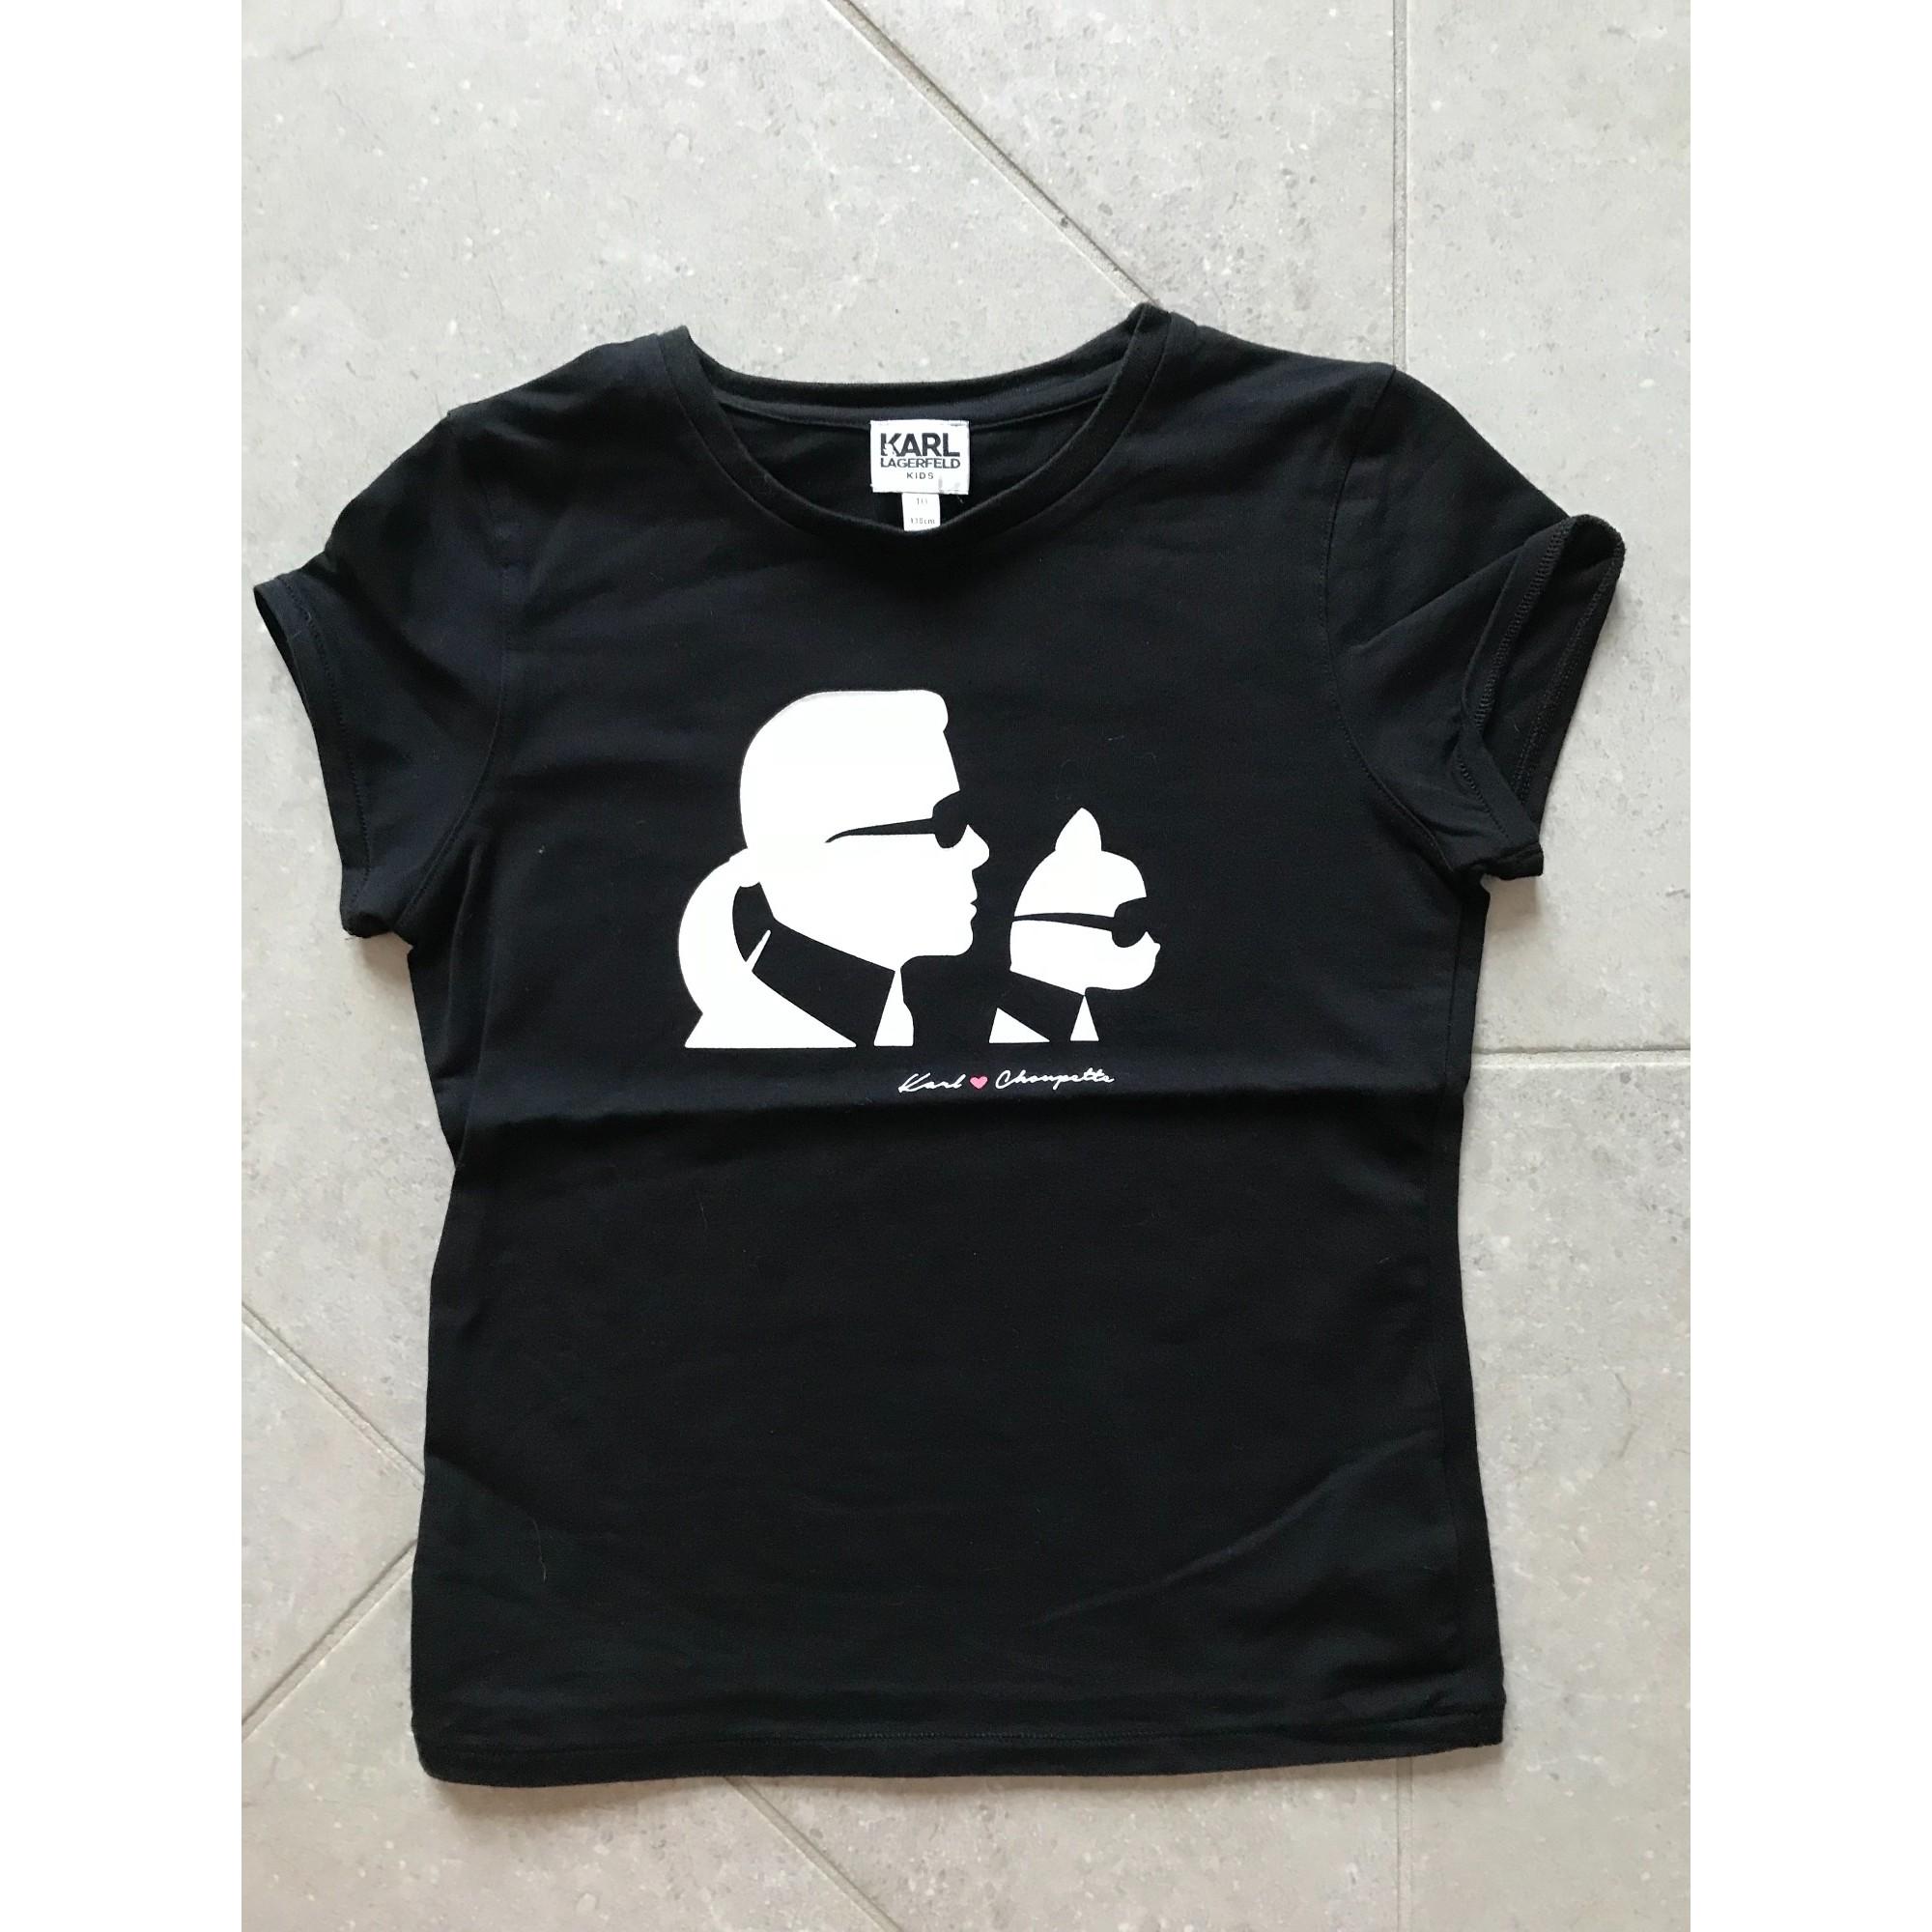 Top, Tee-shirt KARL LAGERFELD coton noir 9-10 ans